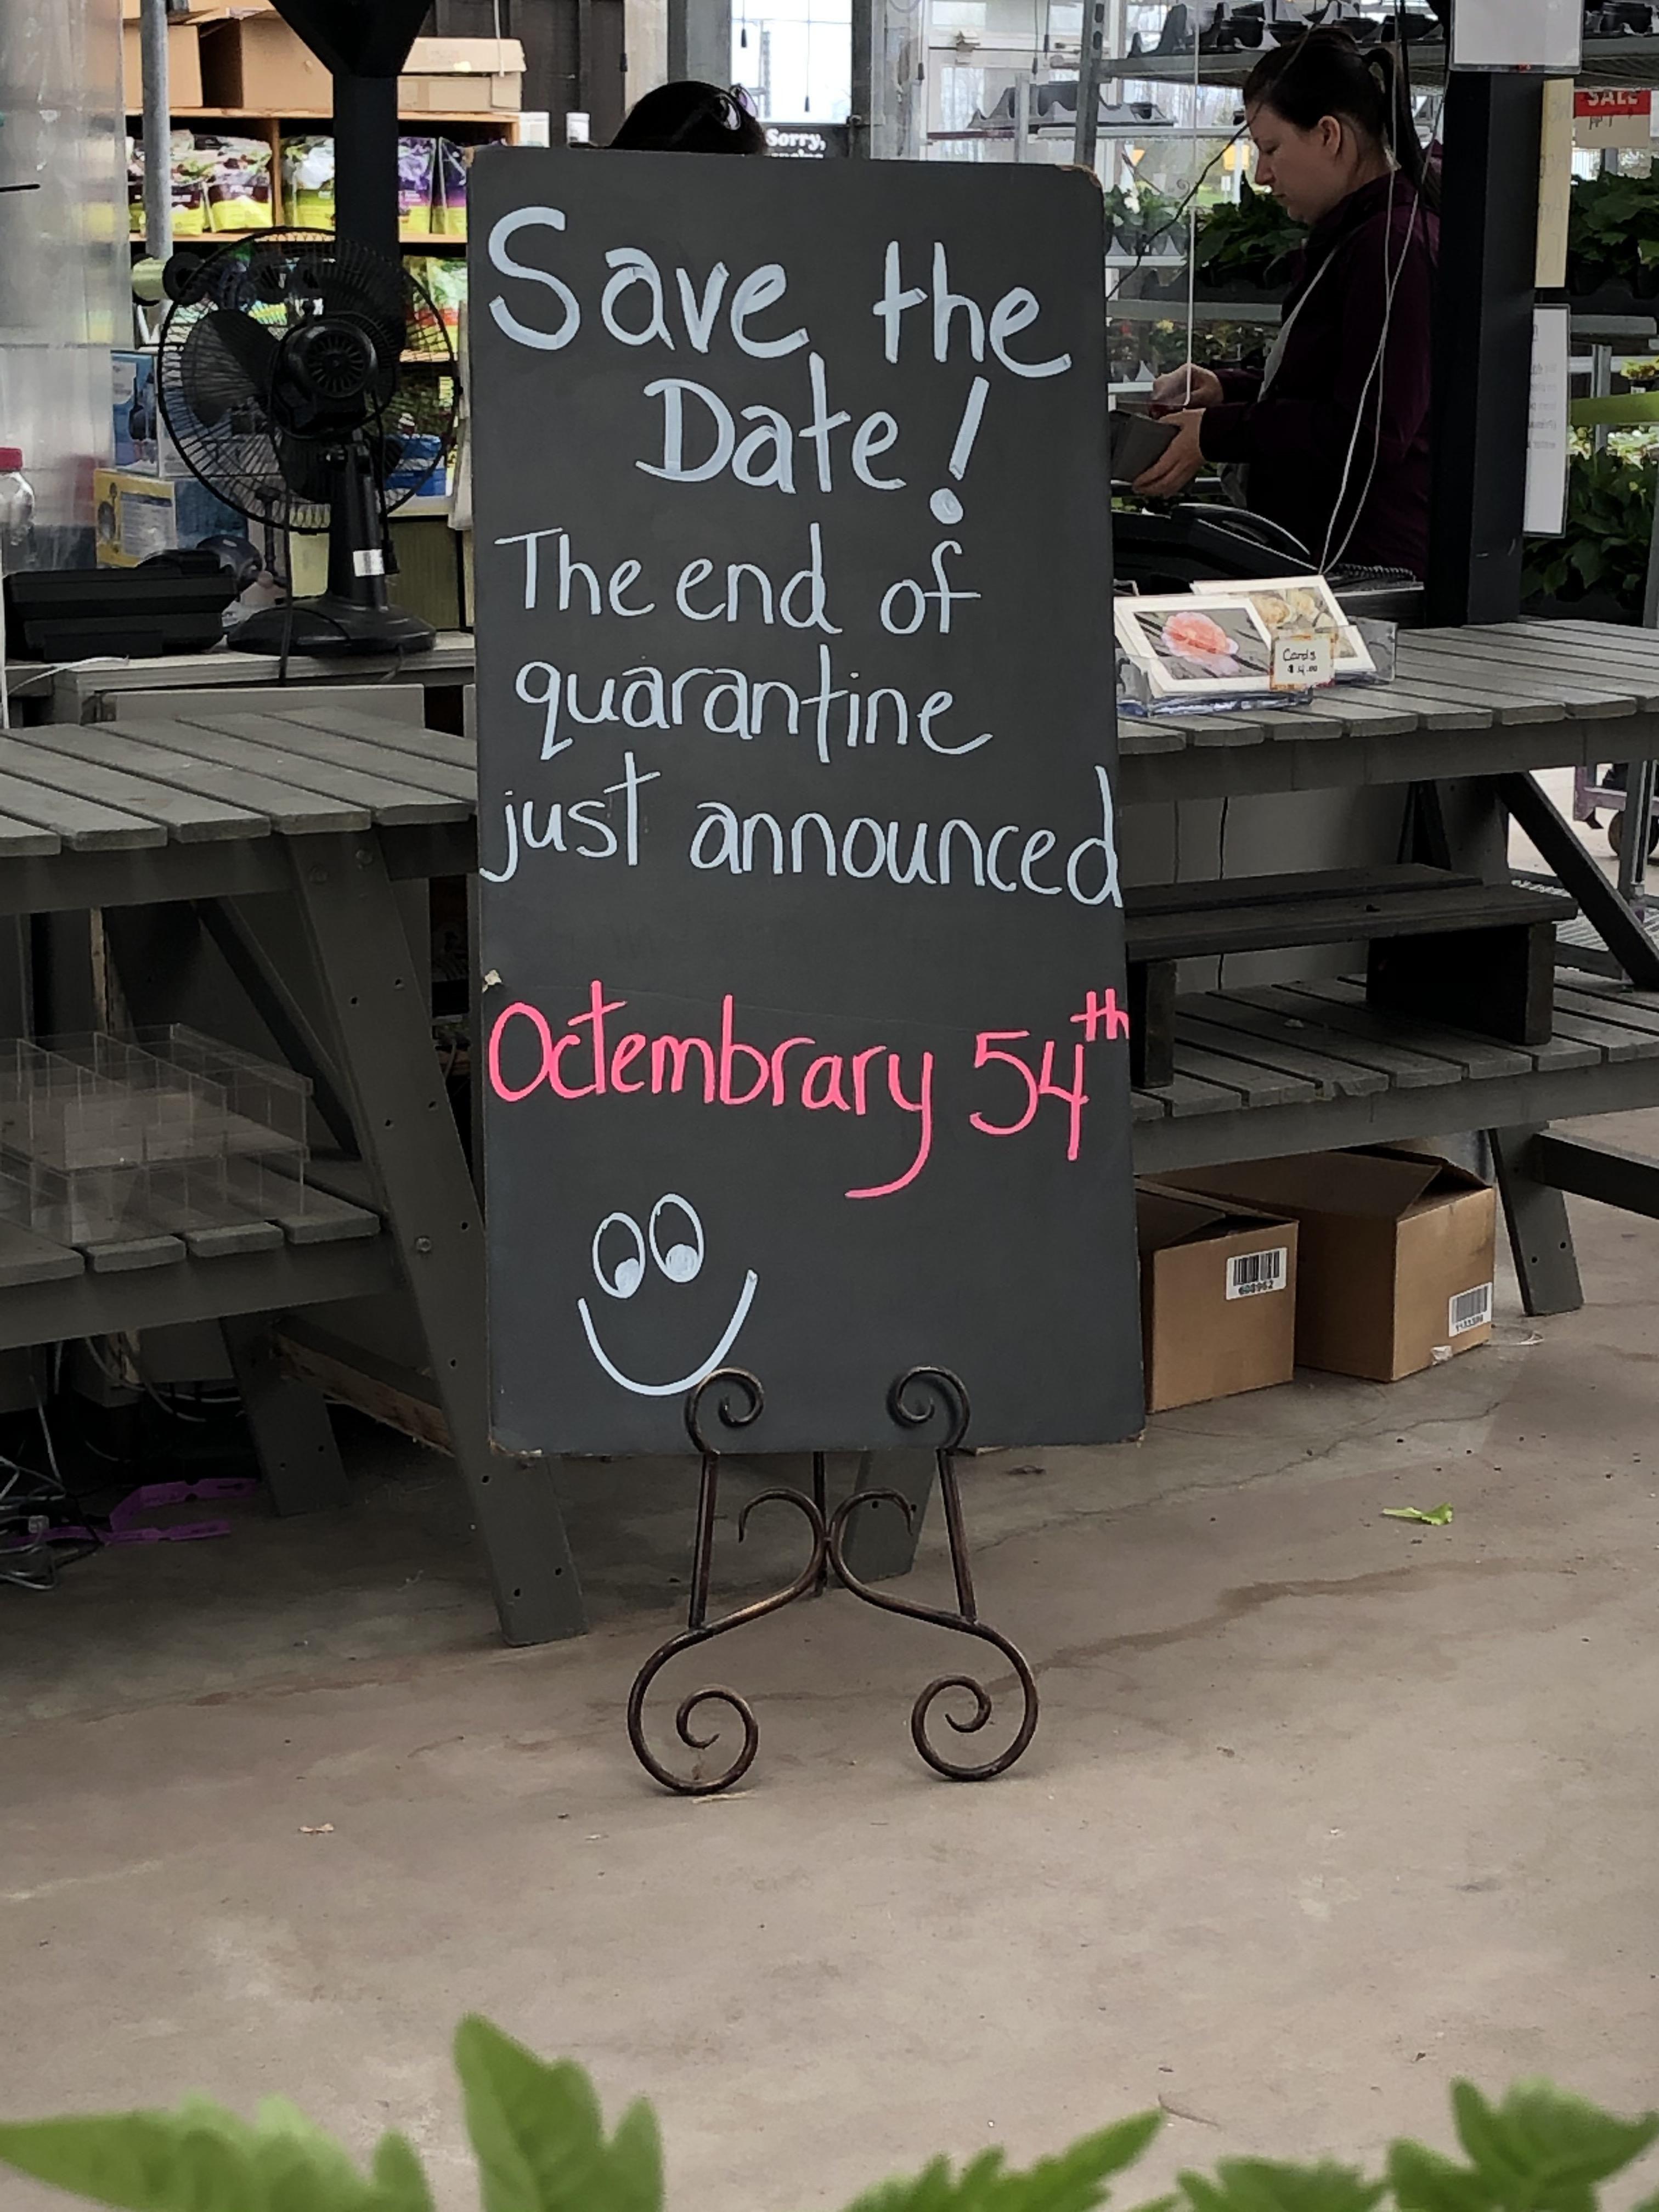 We are optimistic here in Canada!